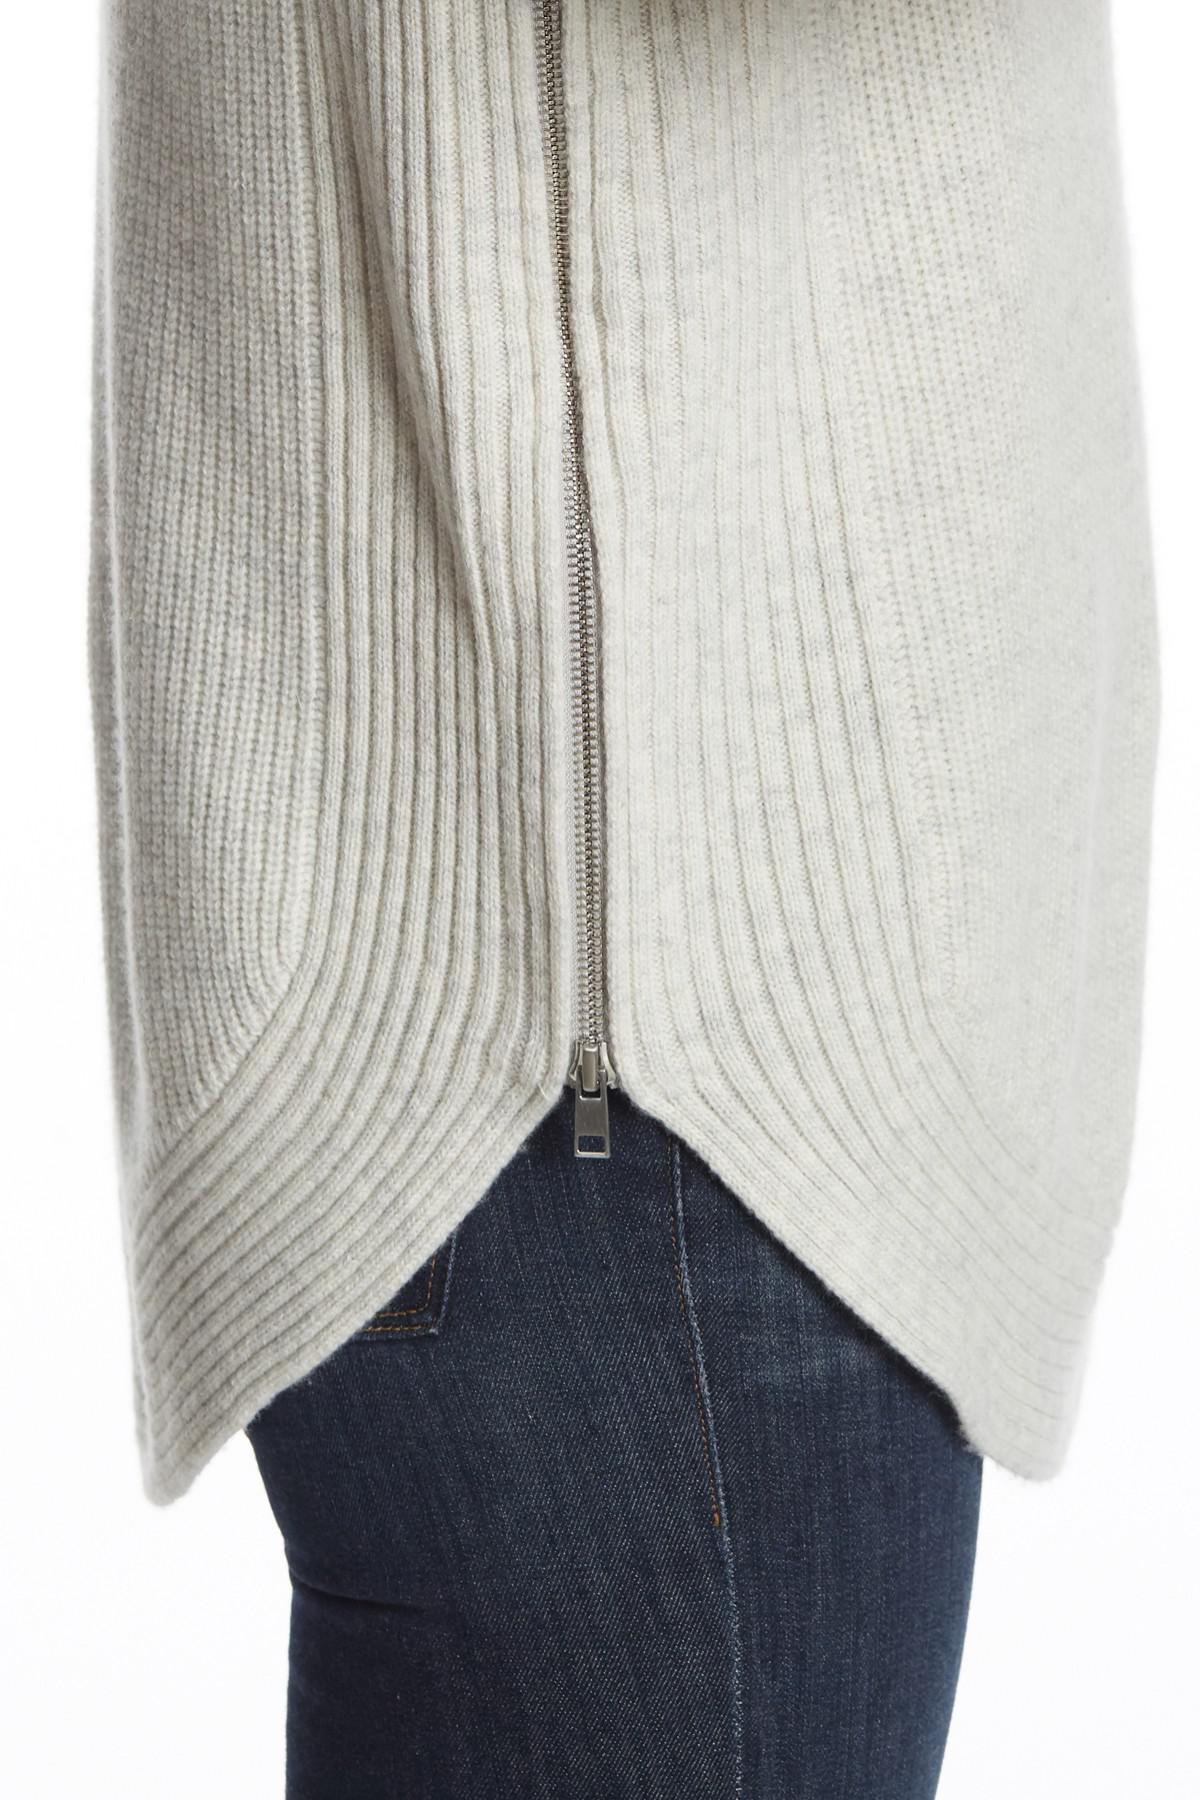 1301d890bec5a Lyst - Vince Side Zip Wool Blend Turtleneck